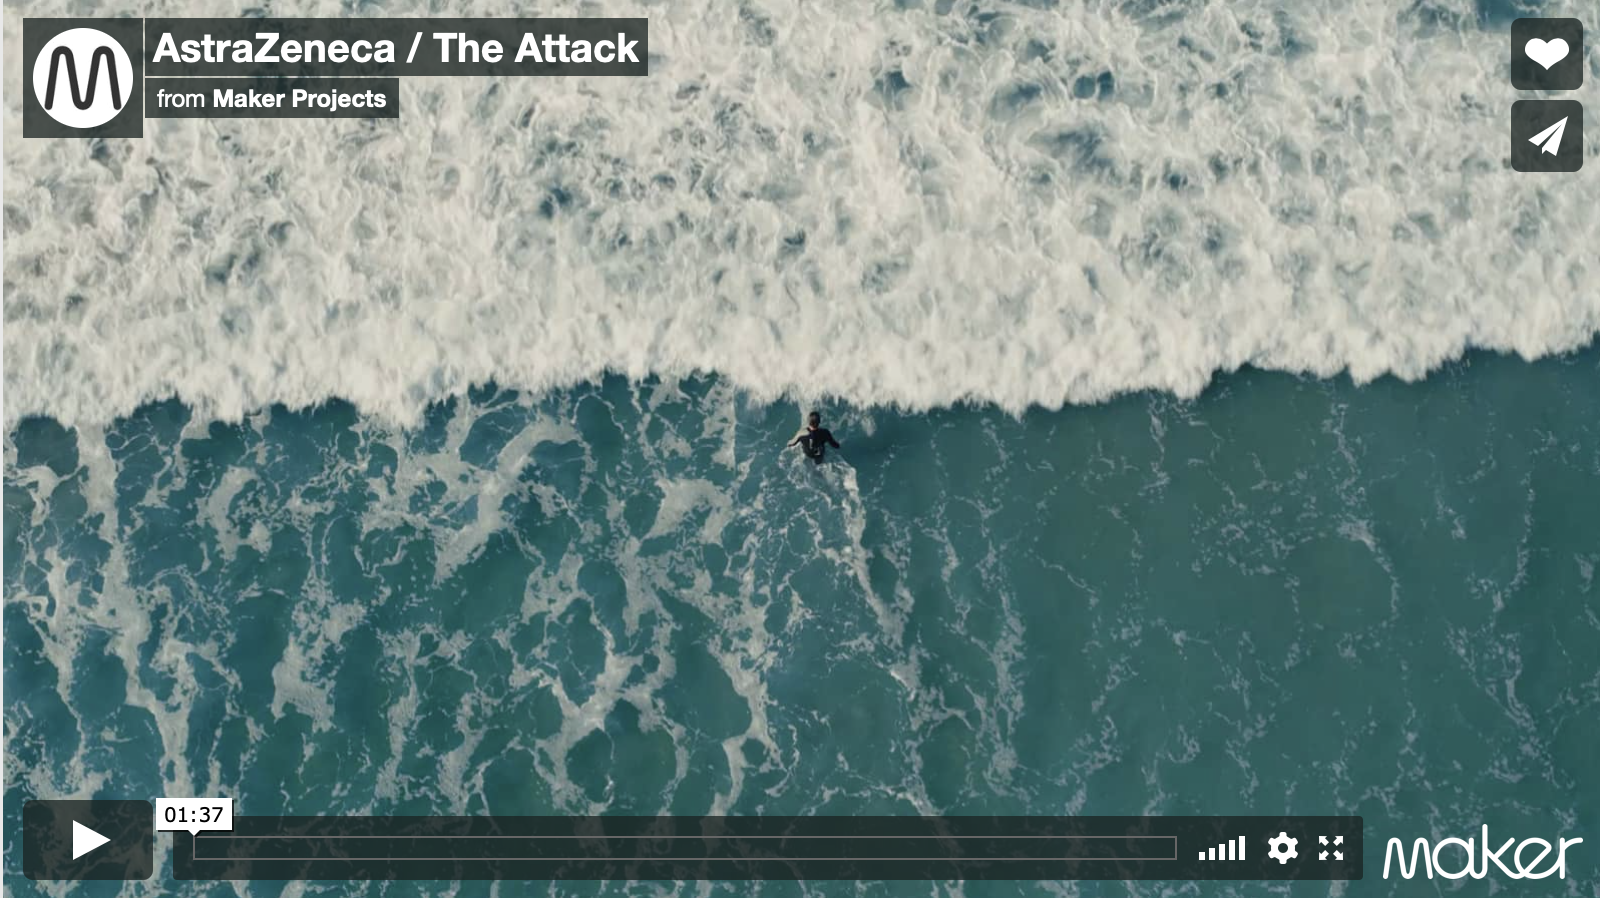 Screenshot from AstraZeneca, 'The Attack'